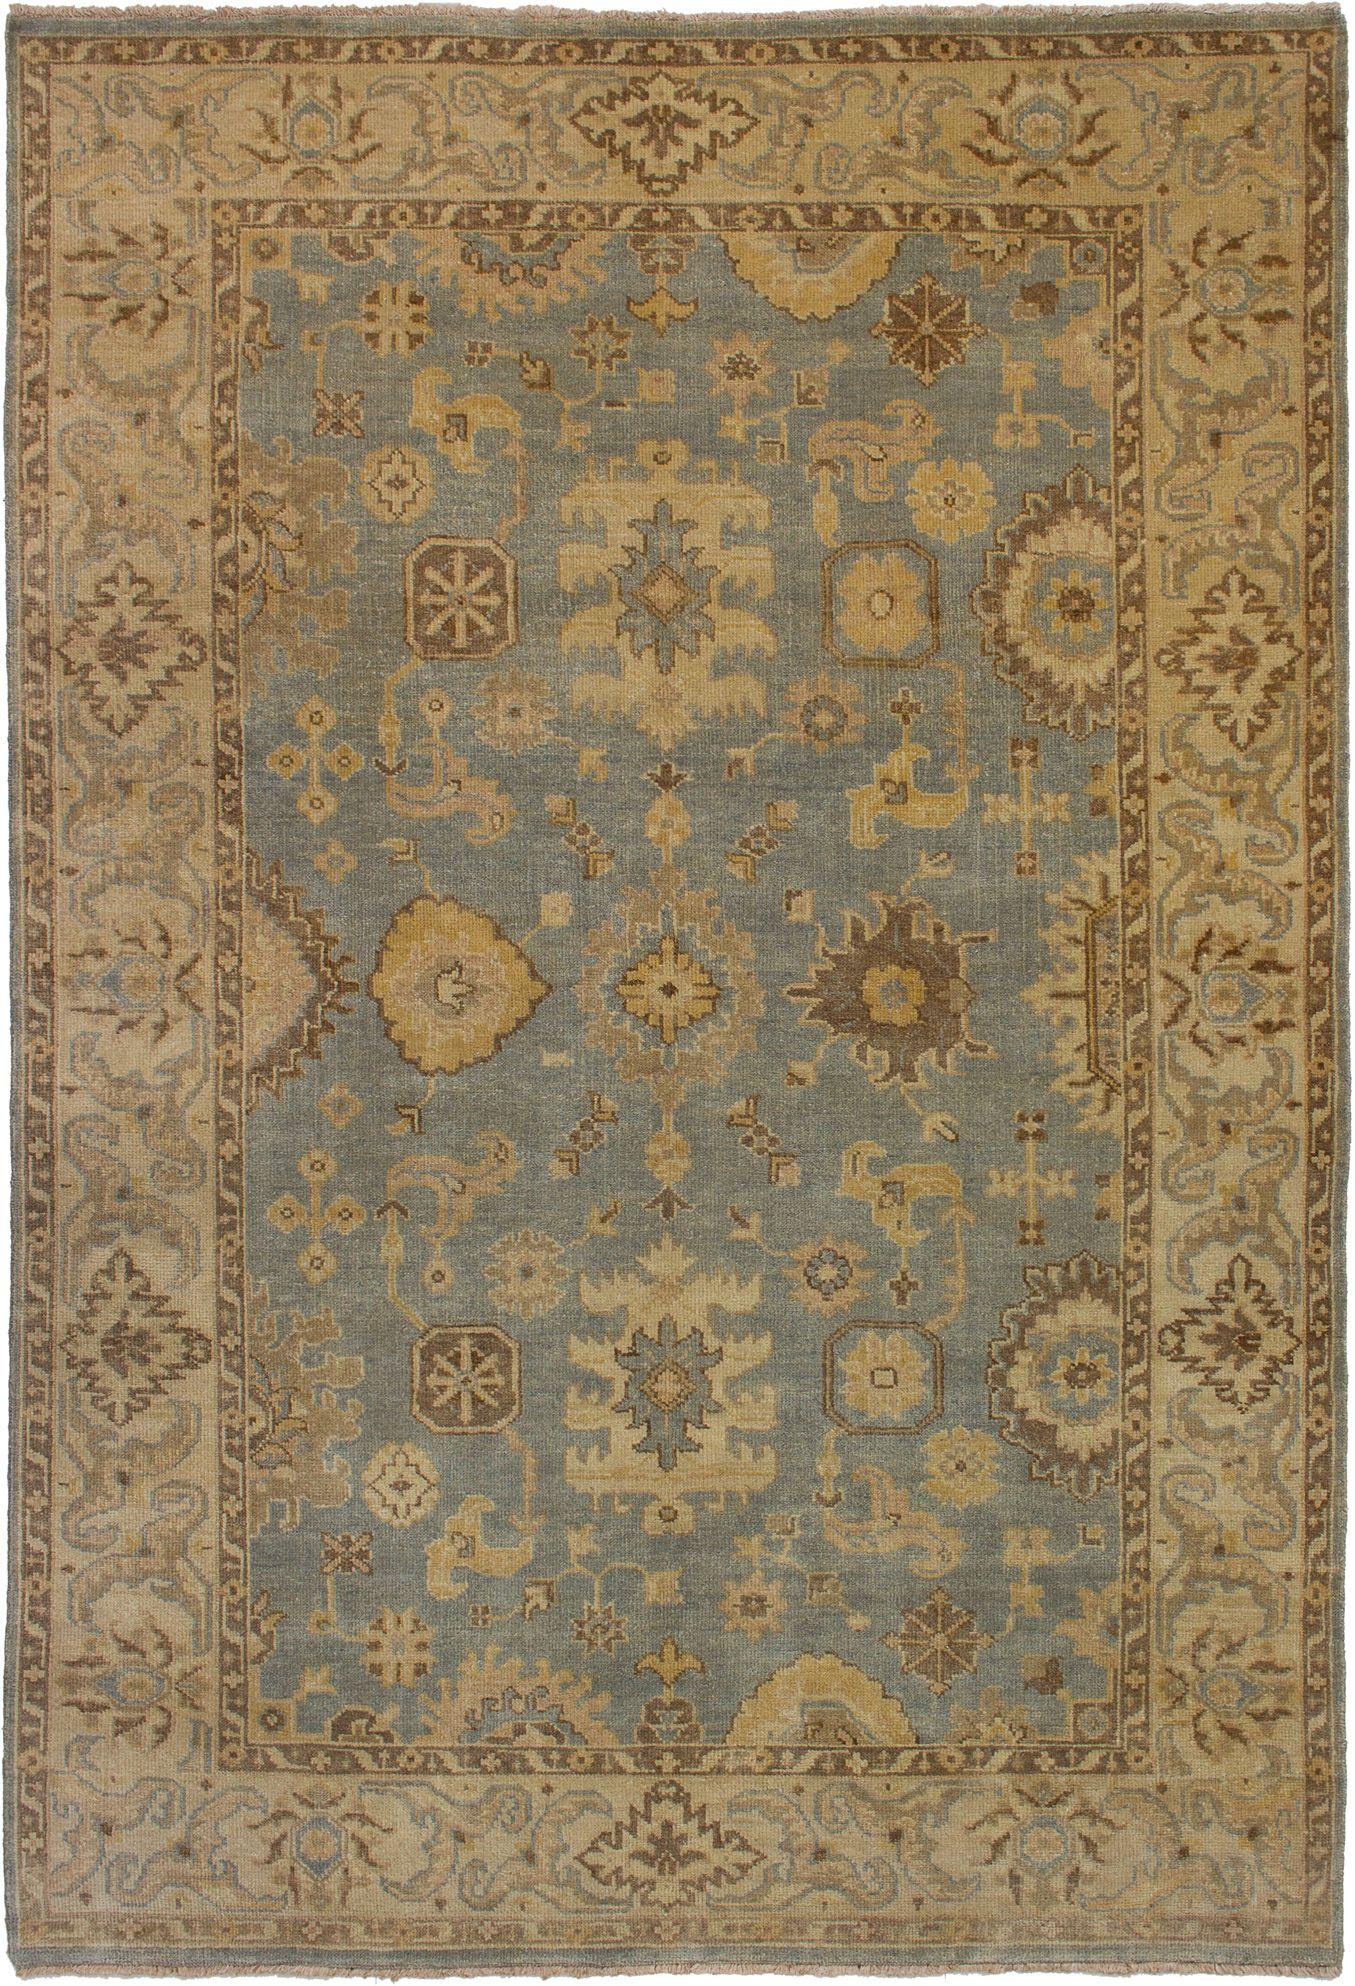 "Hand-knotted Royal Ushak Light Blue  Wool Rug 6'0"" x 8'9"" Size: 6'0"" x 8'9"""